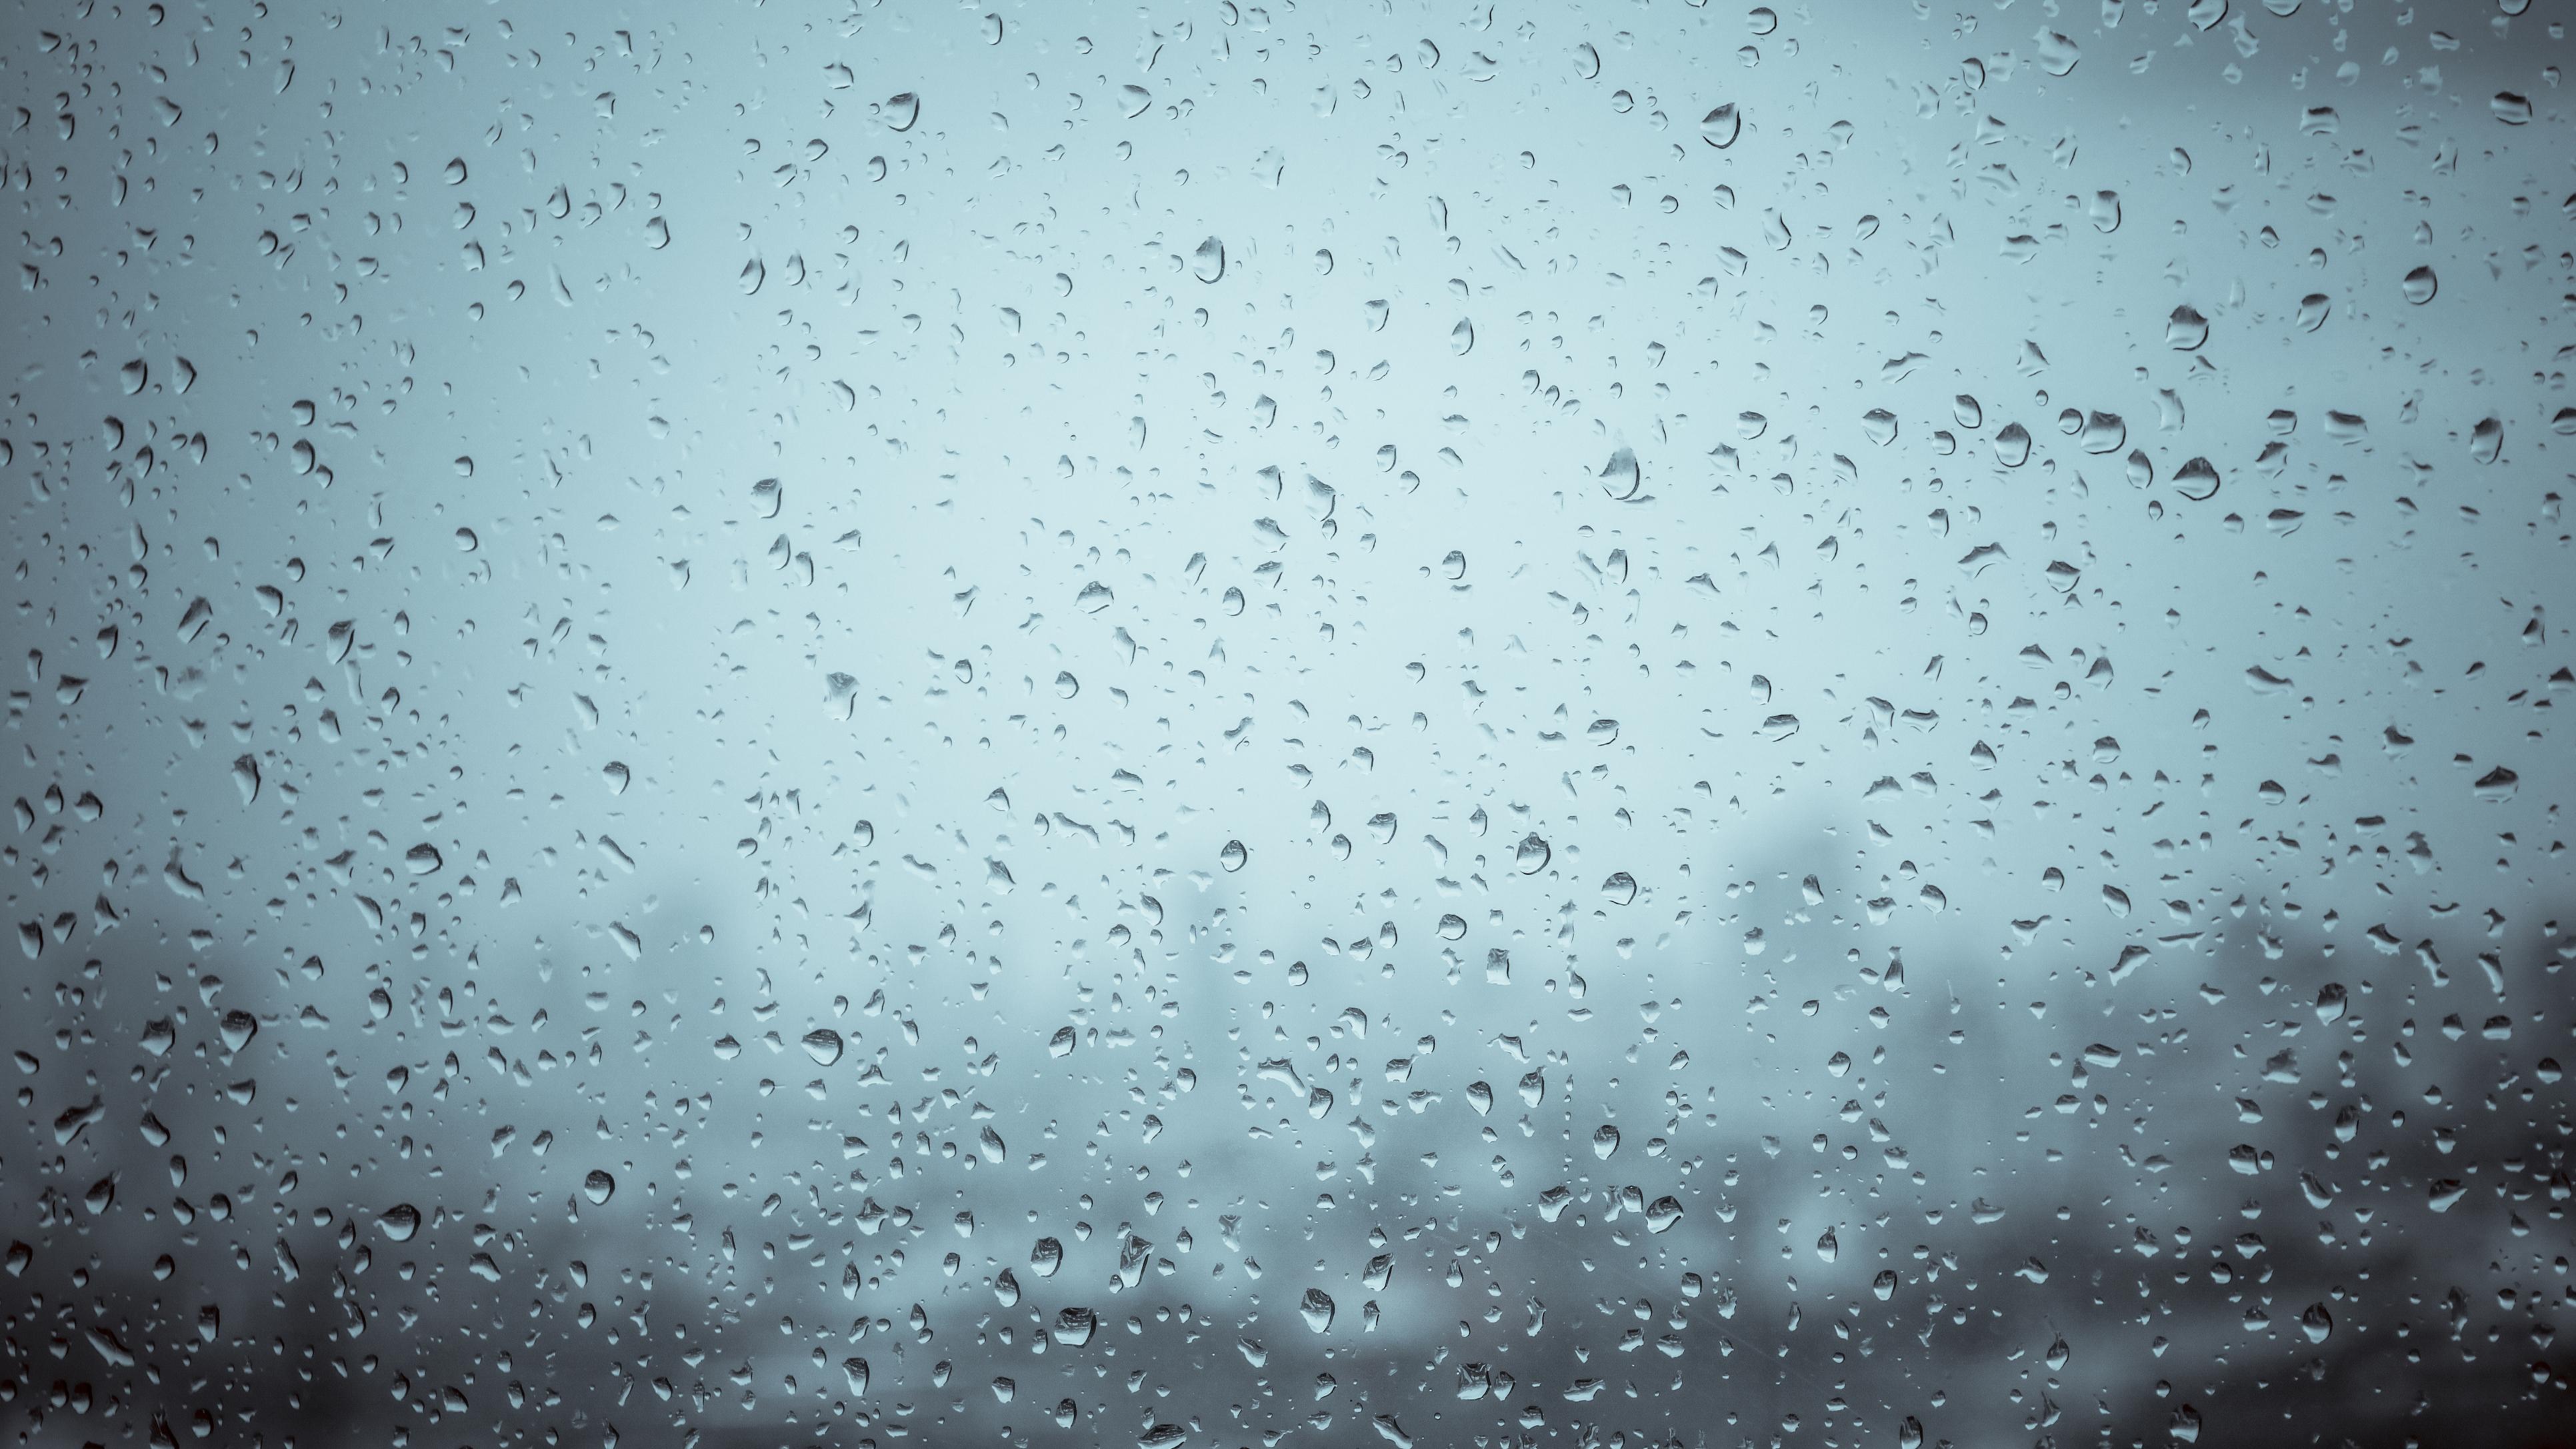 Raindrops on a window on a gloomy day to illustrate an FAQ on seasonal affective disorder (SAD)